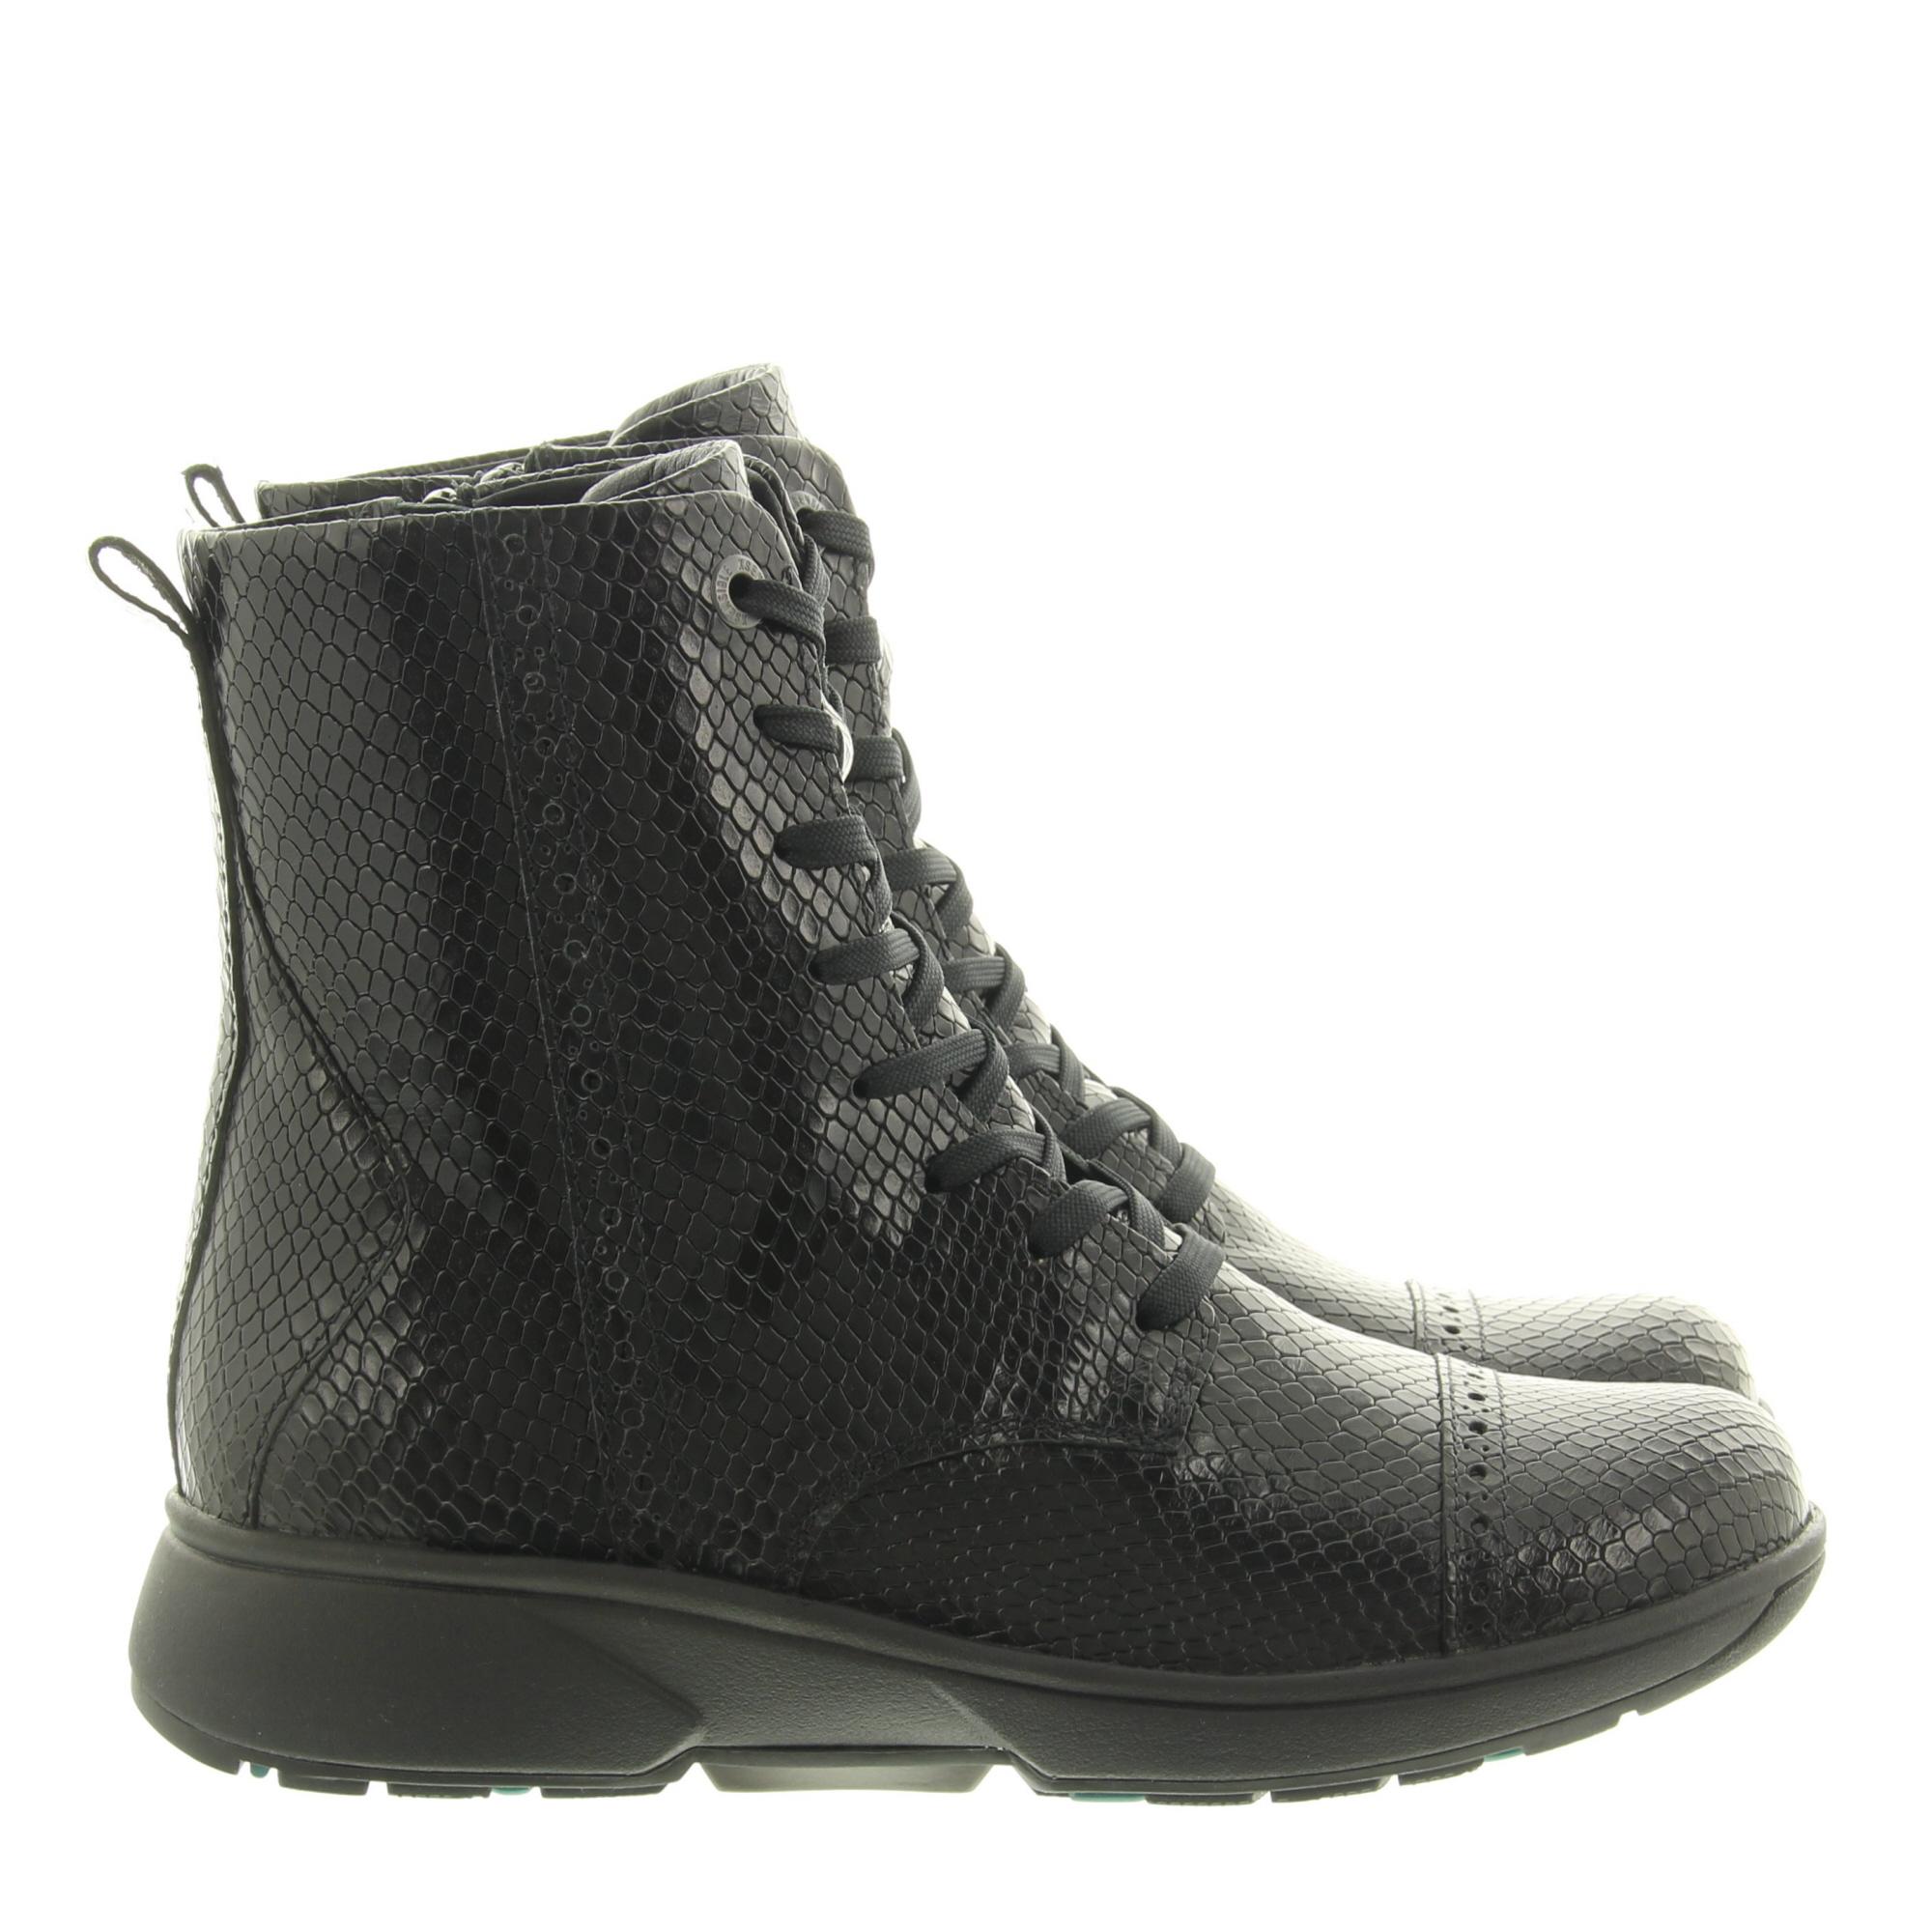 Xsensible 30213.3.093 Aosta Black Croco